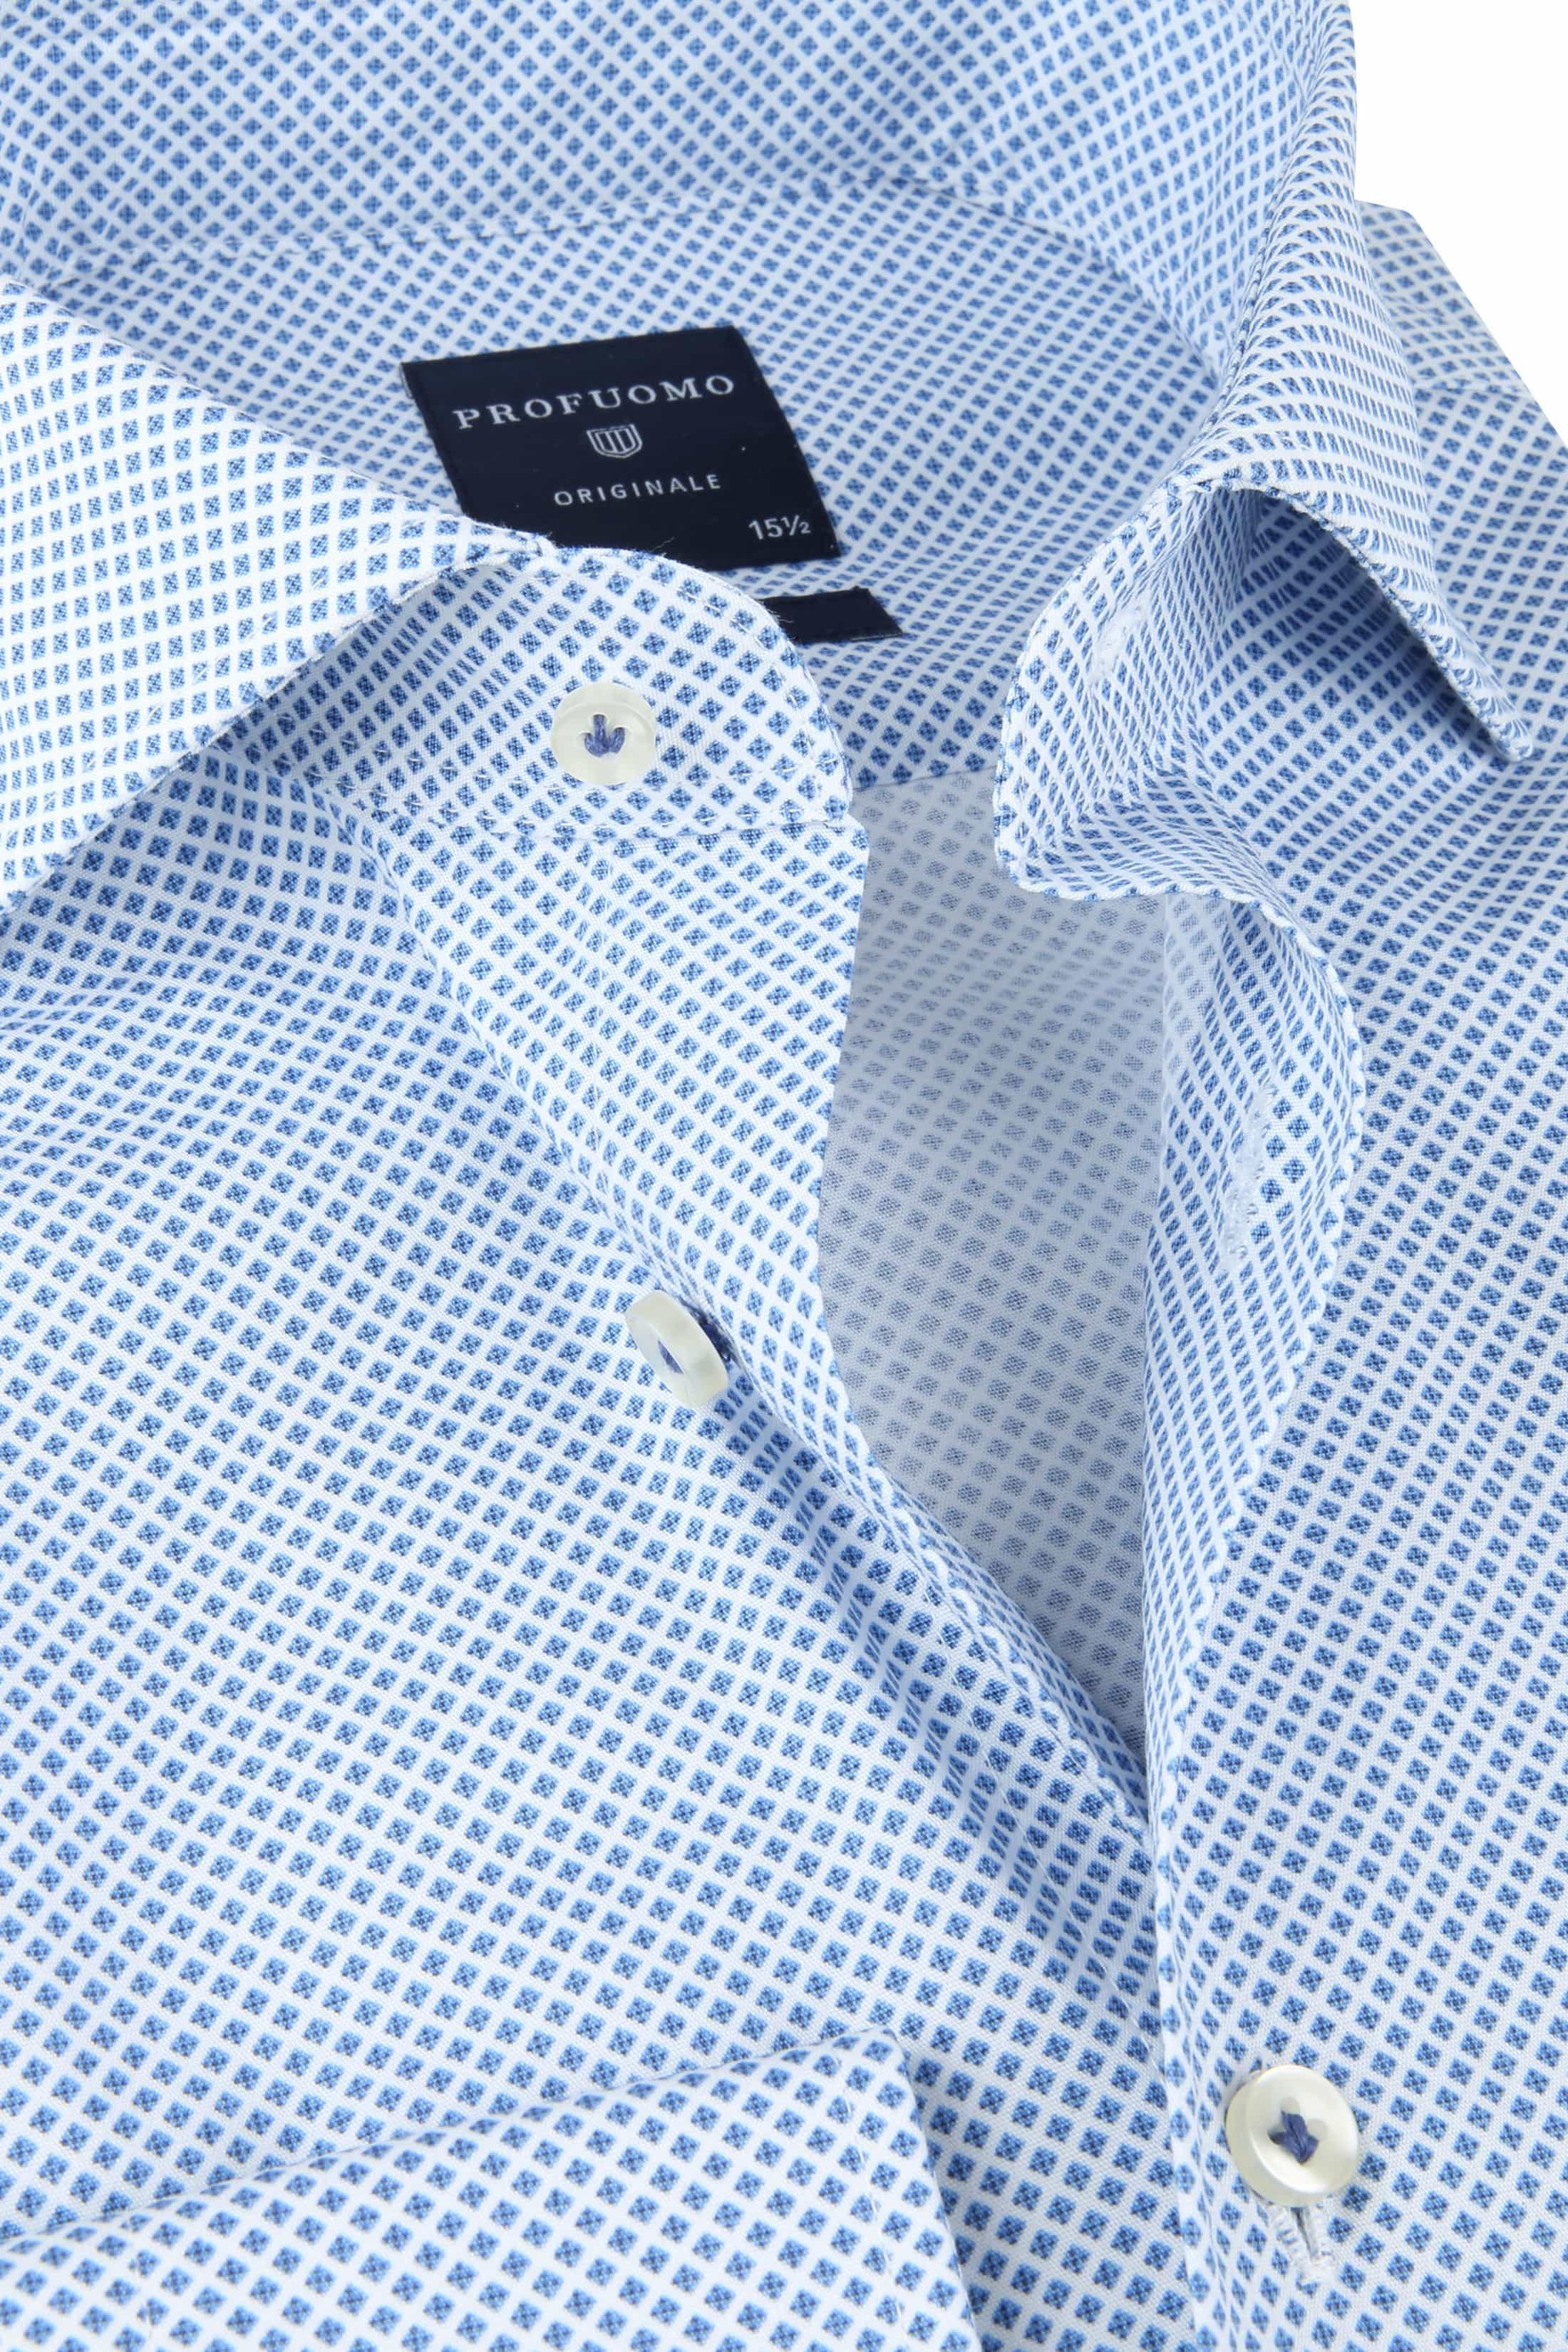 Profuomo SF Overhemd Ruiten Blauw foto 1